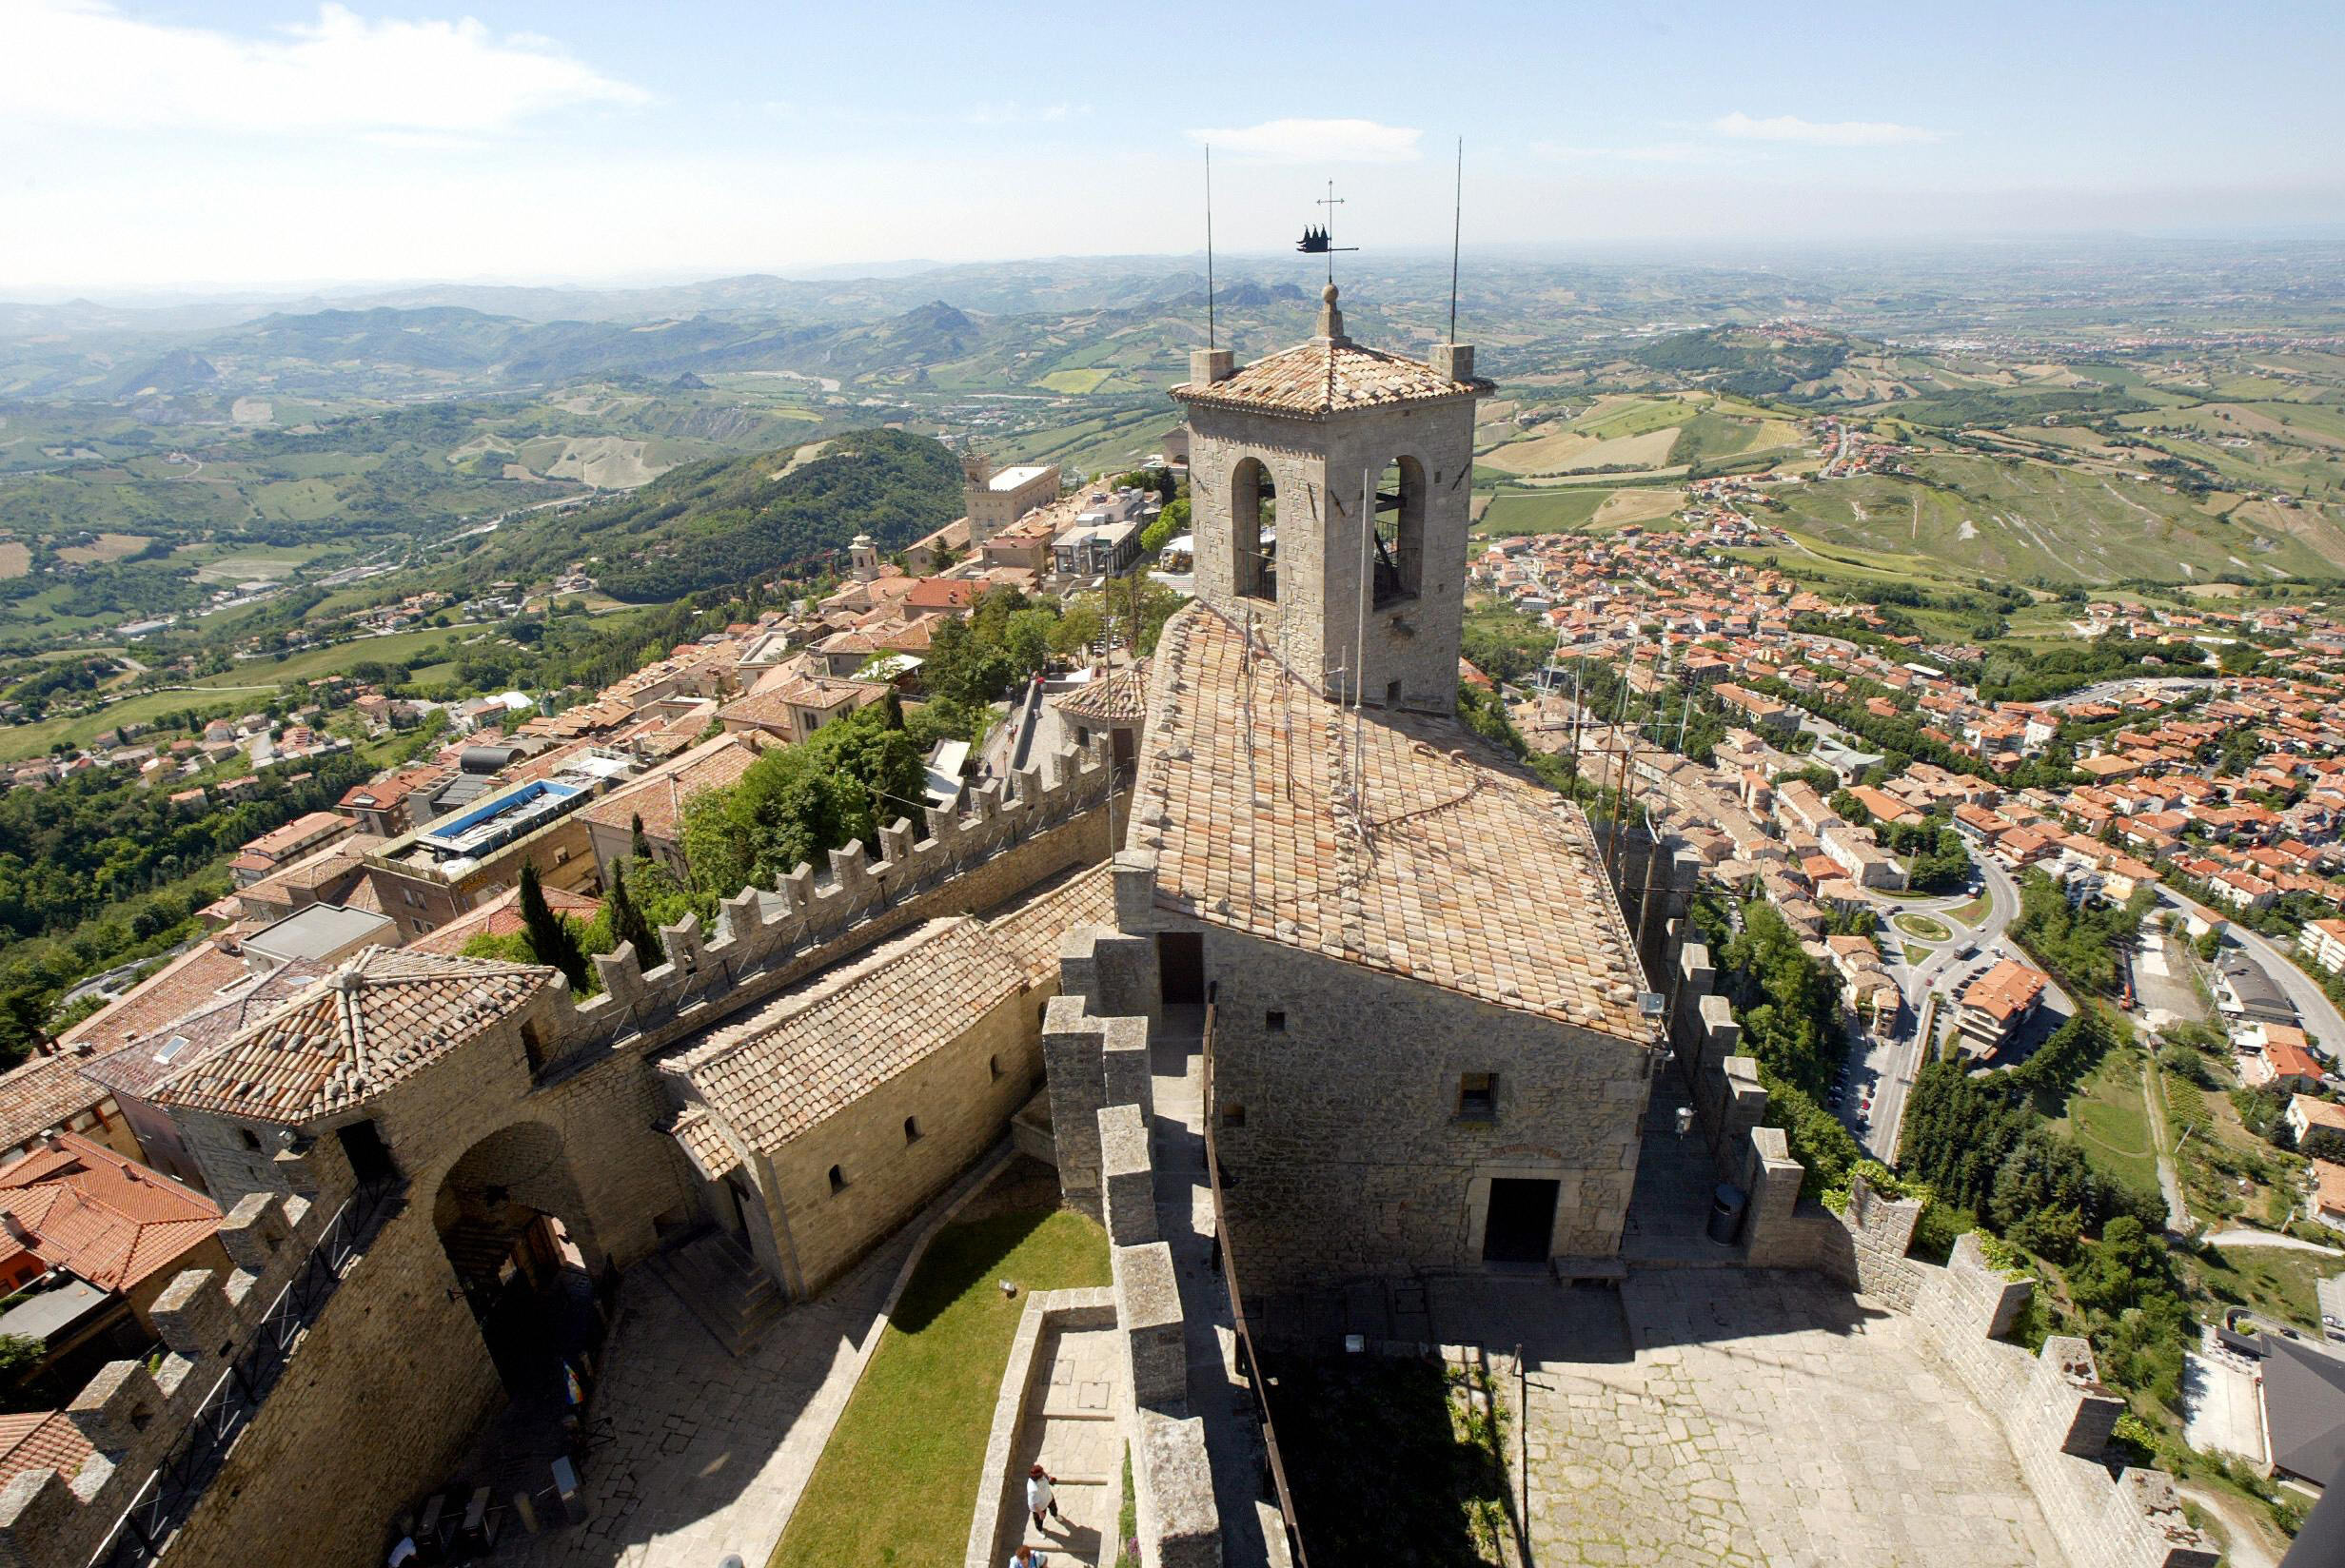 La Guaita guarding over the walled enclosure of historic San Marino